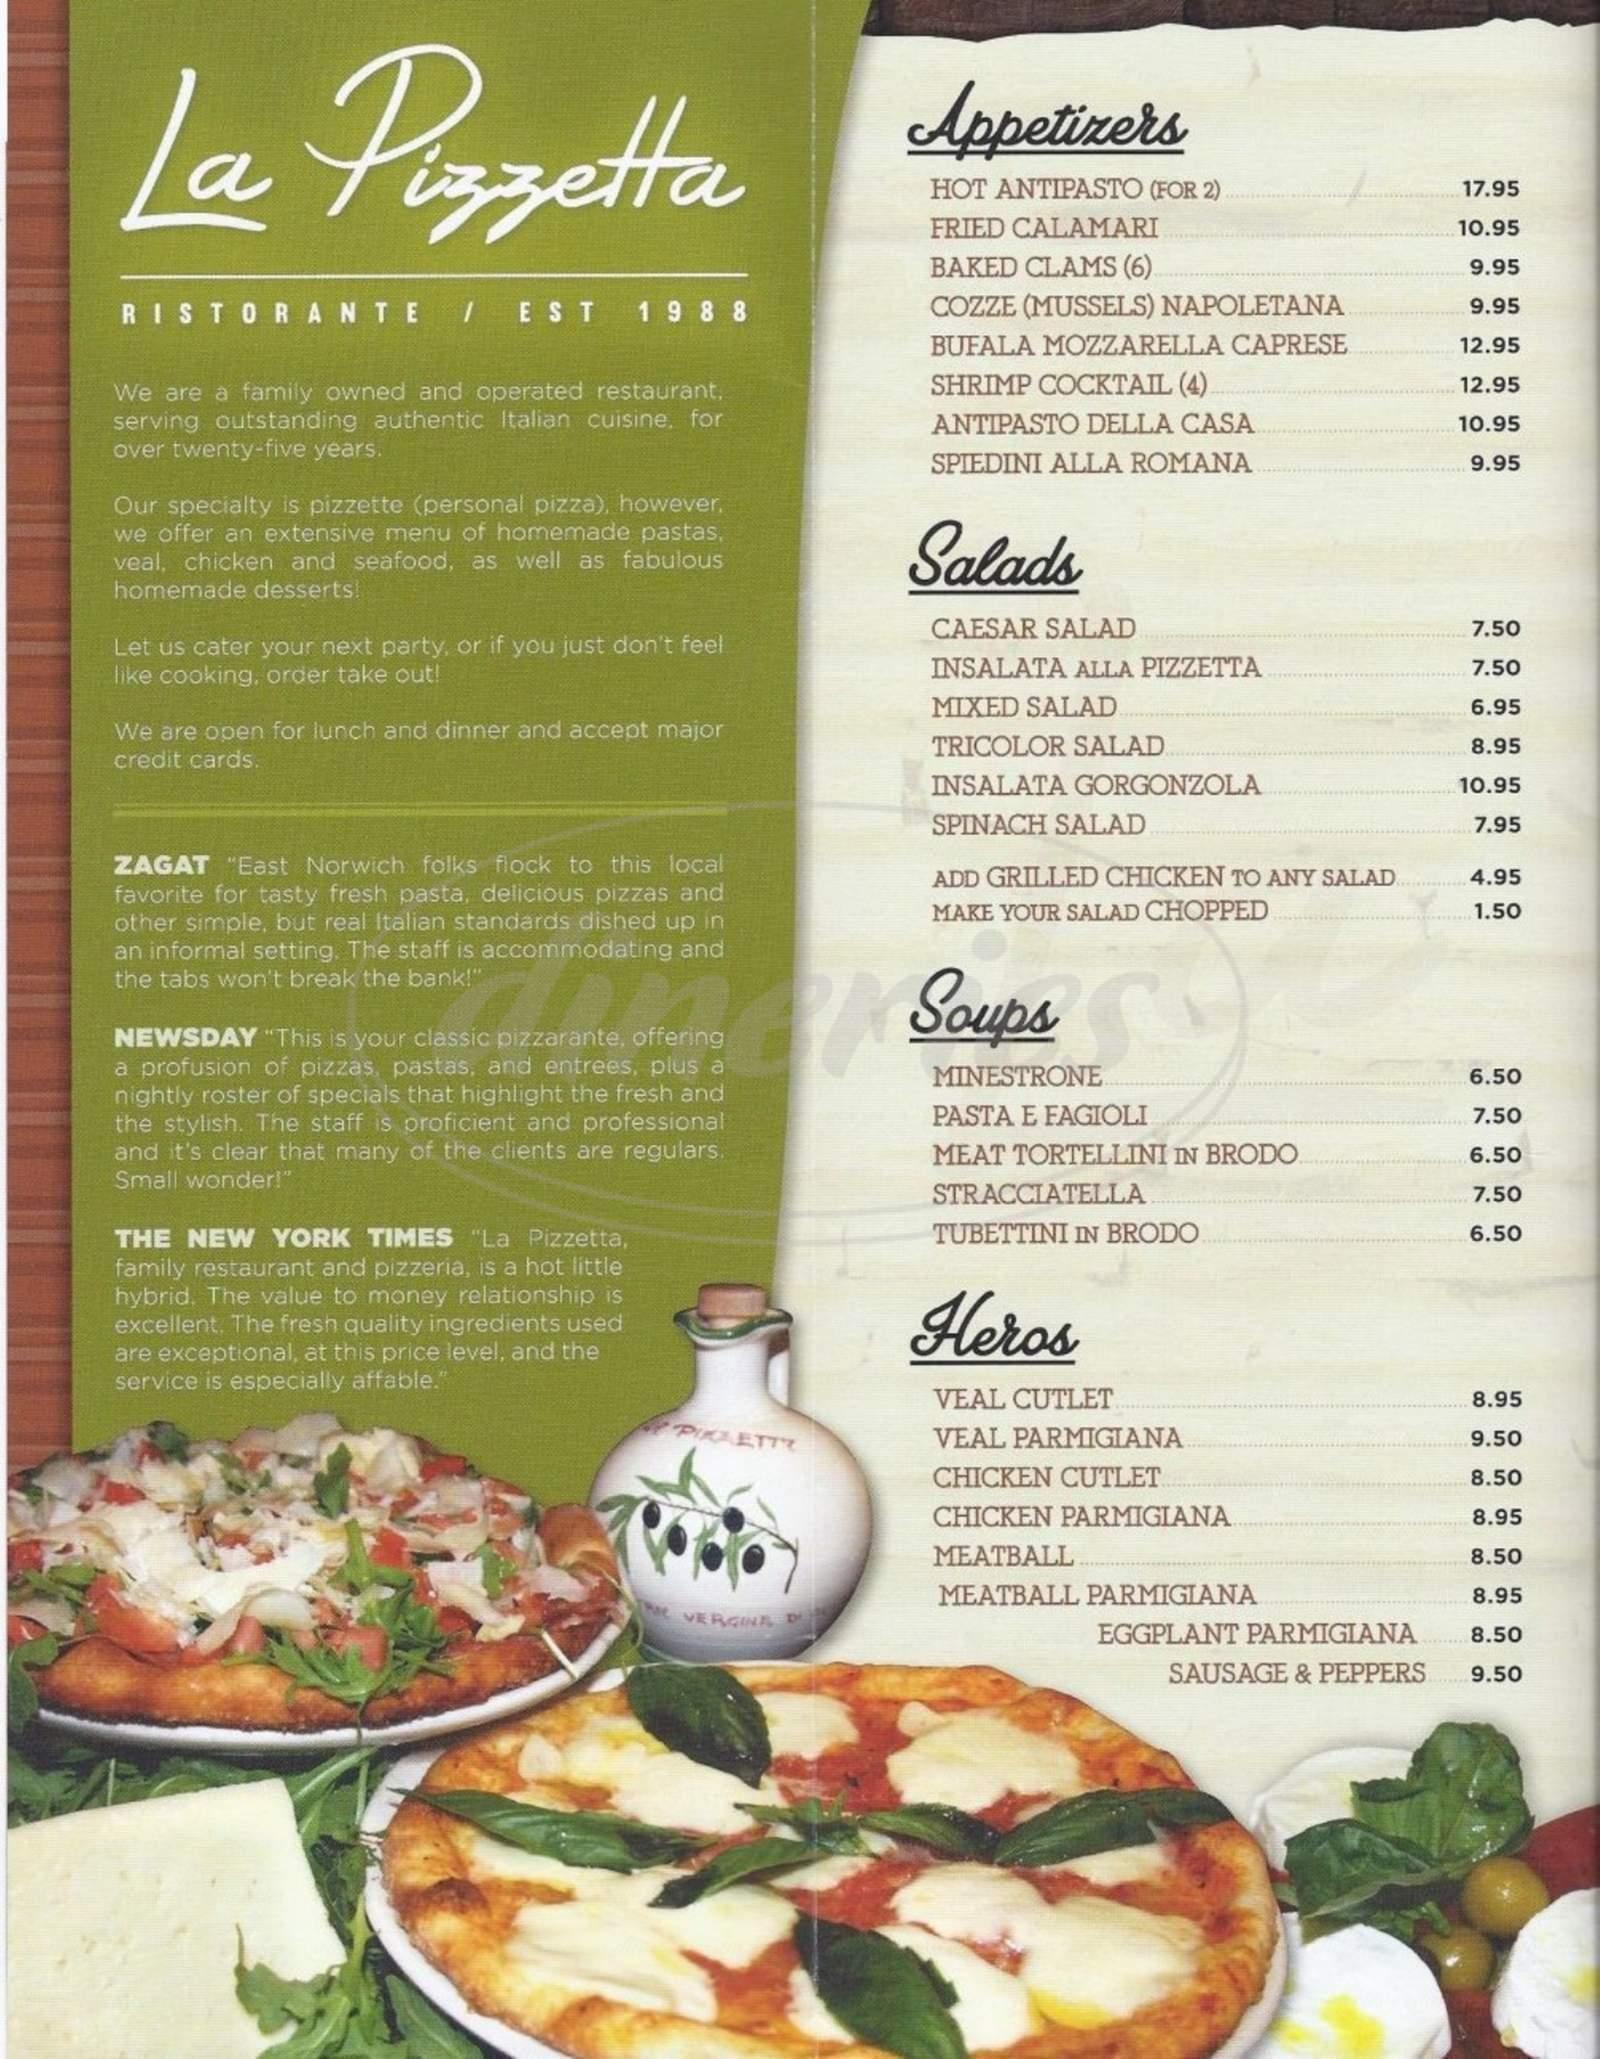 menu for La Pizzetta